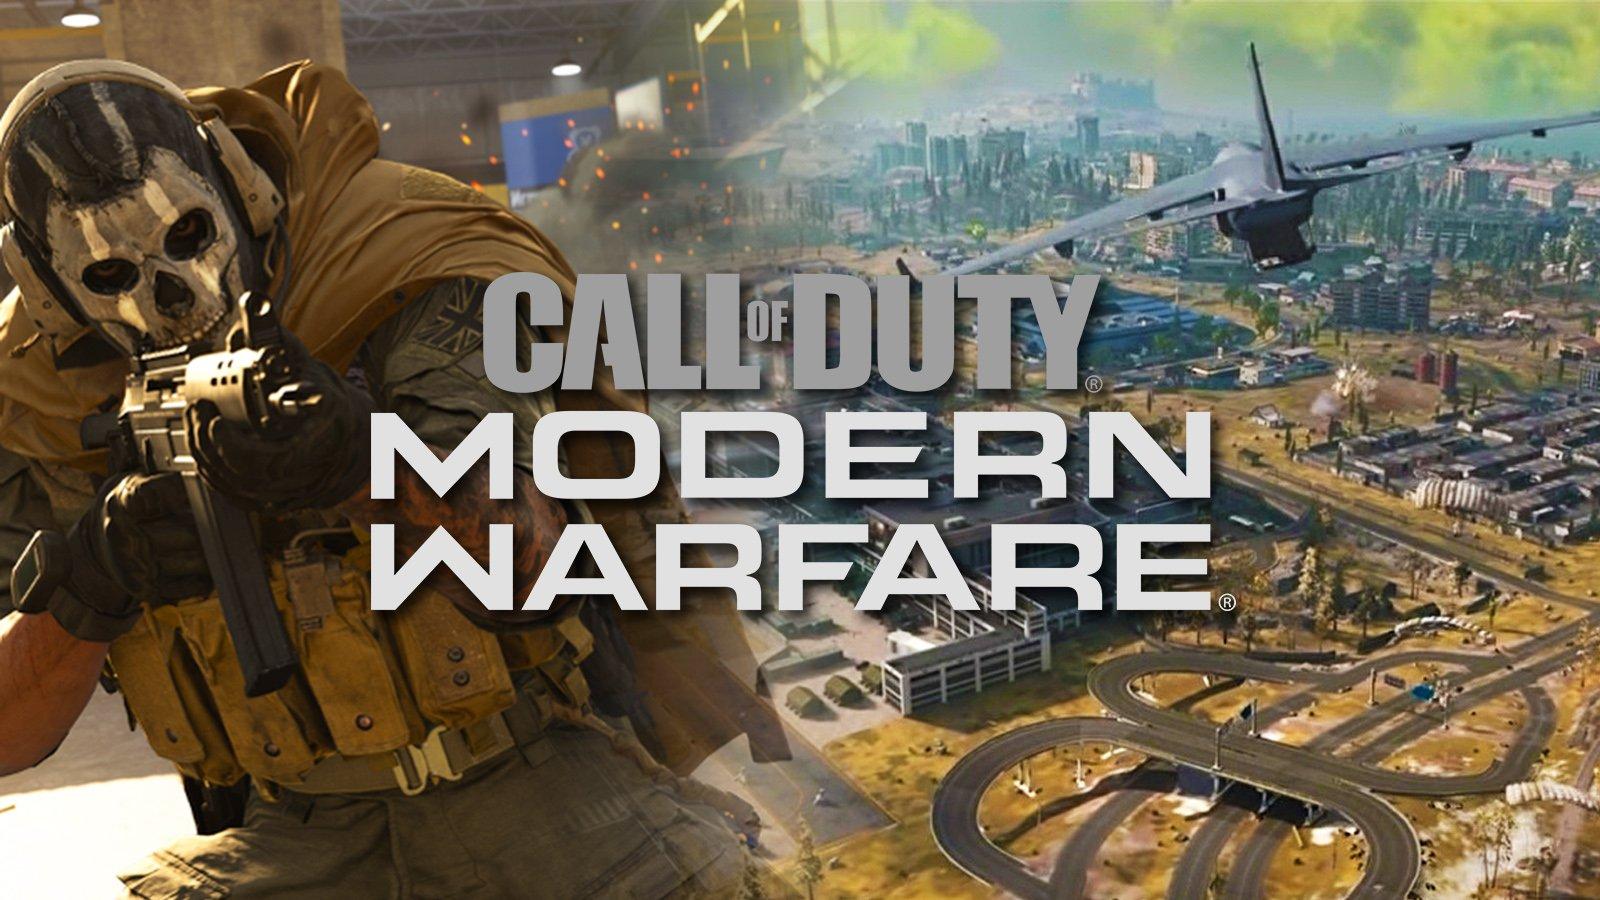 A Activision parece estar revendo algumas das proibições de Call of Duty: Modern Warfare e Call of Duty: Warzone.